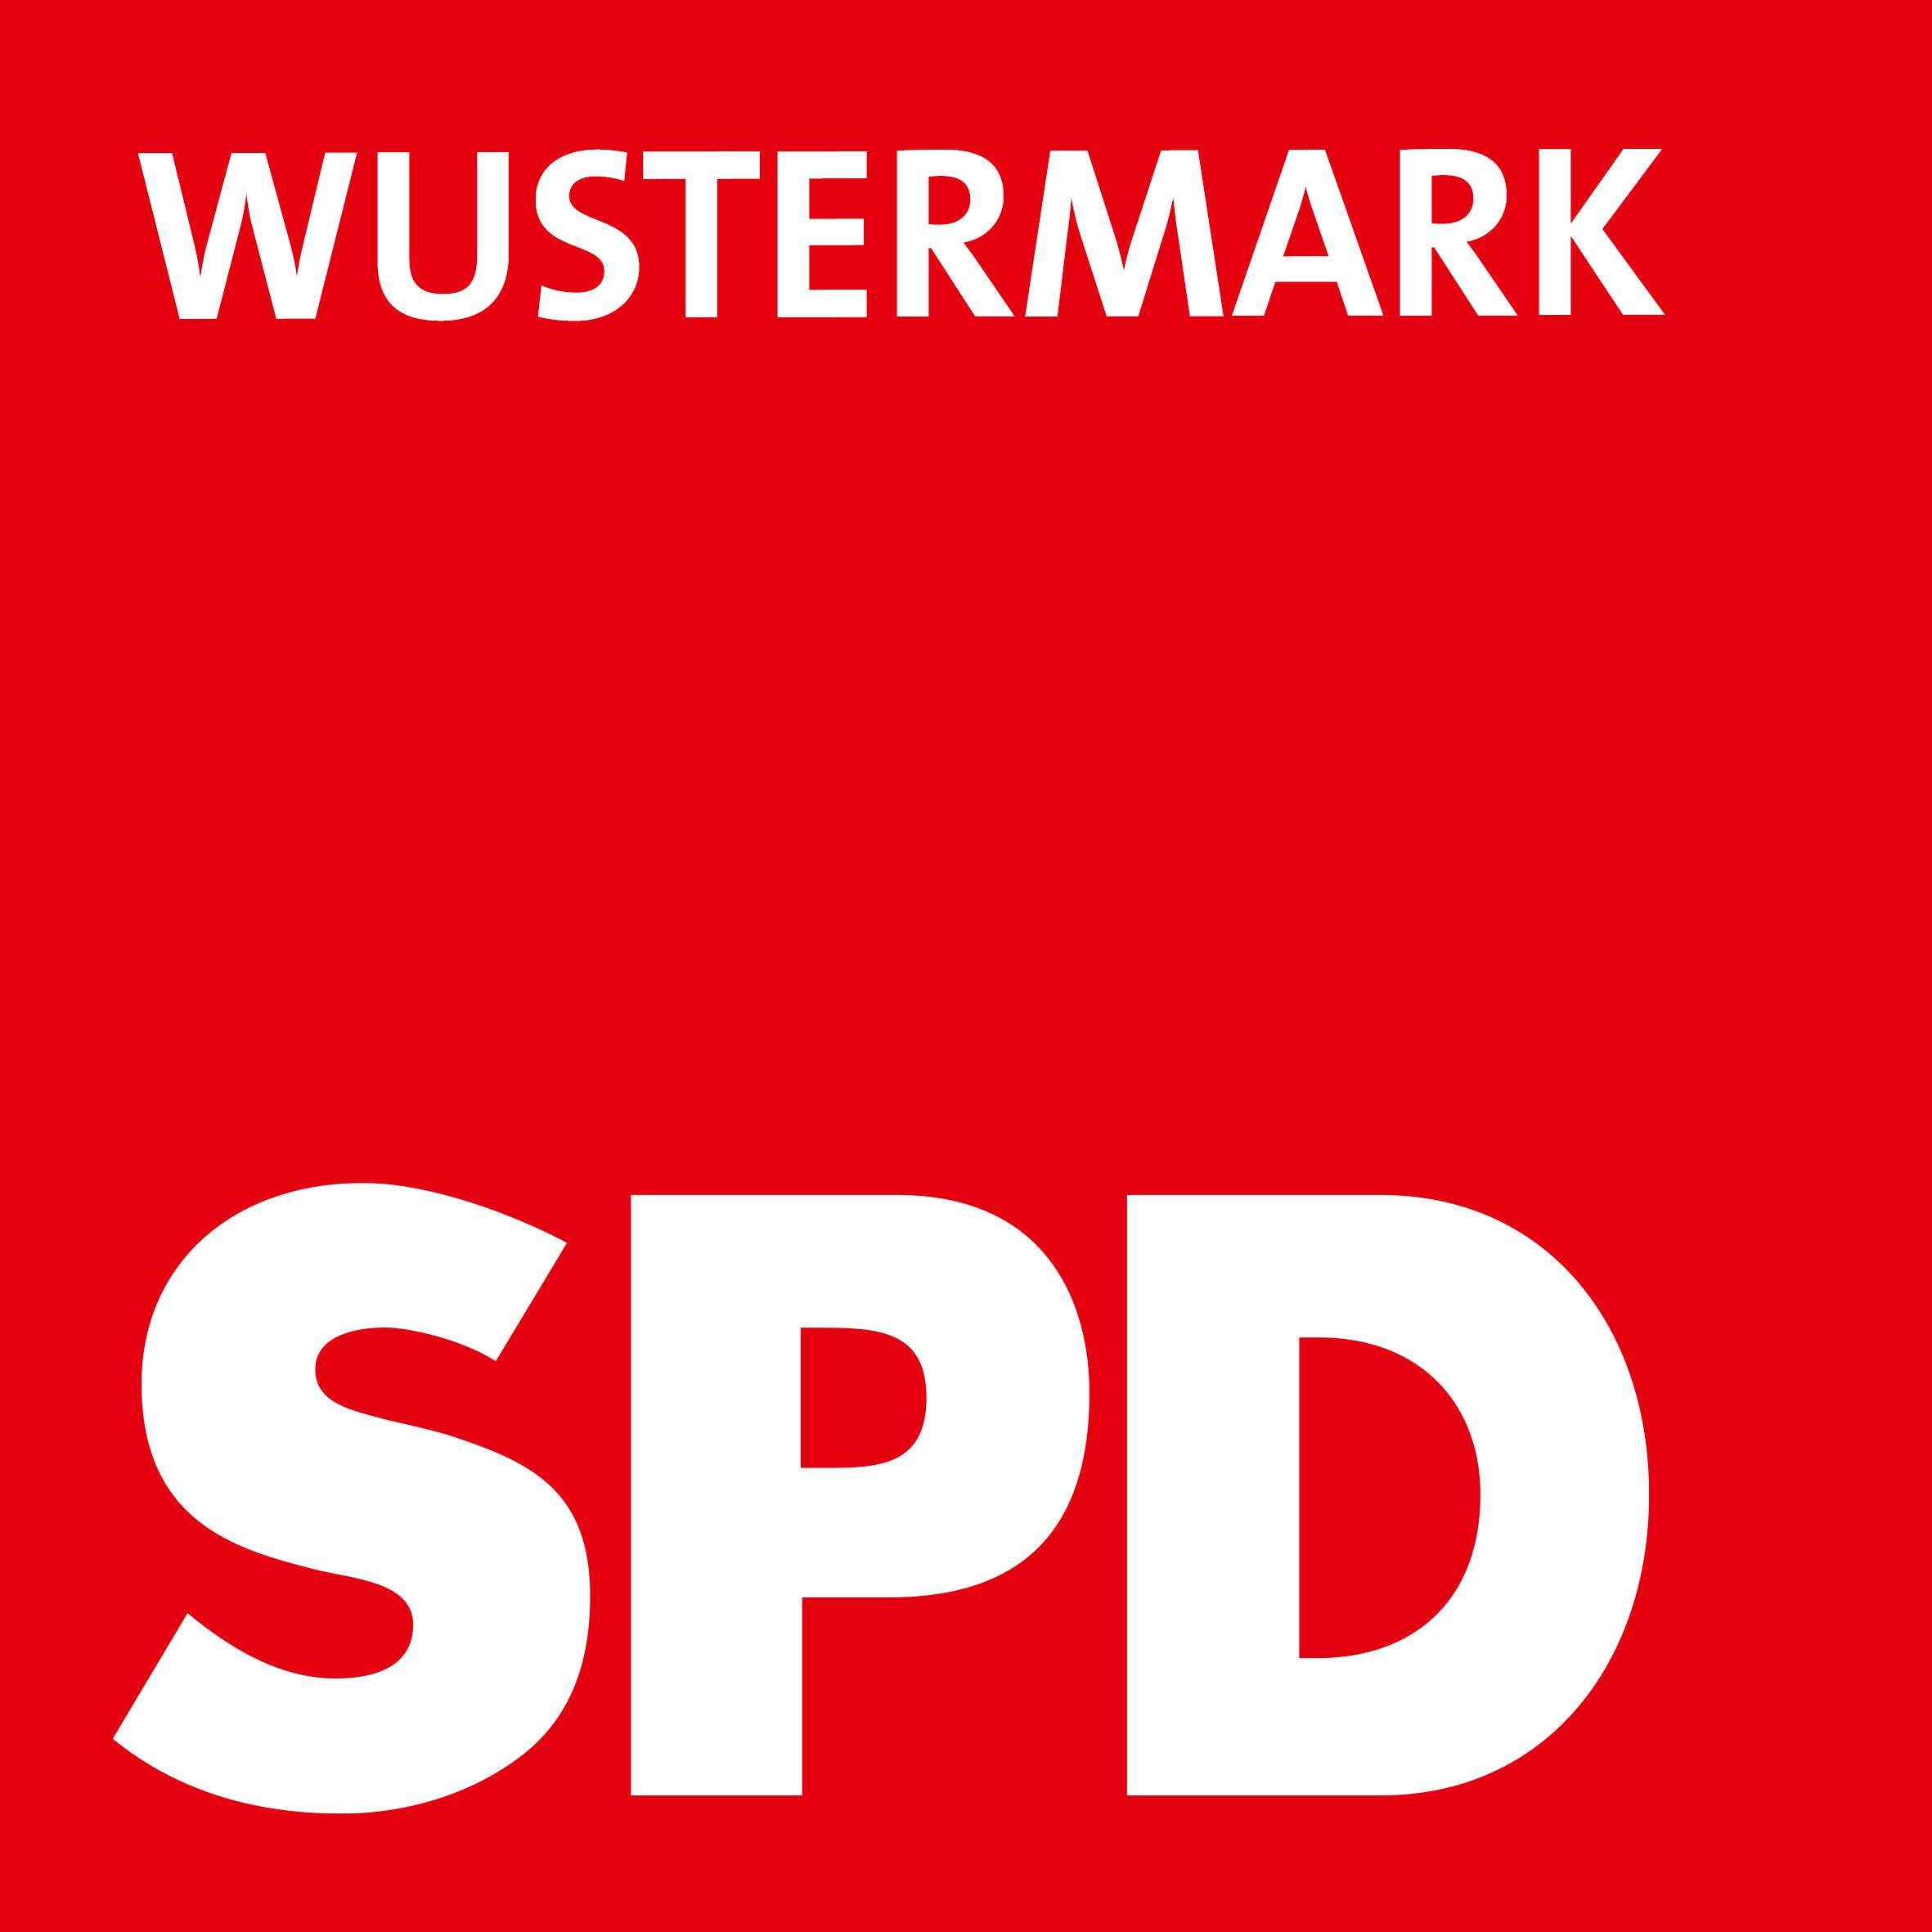 SPD Wustermark